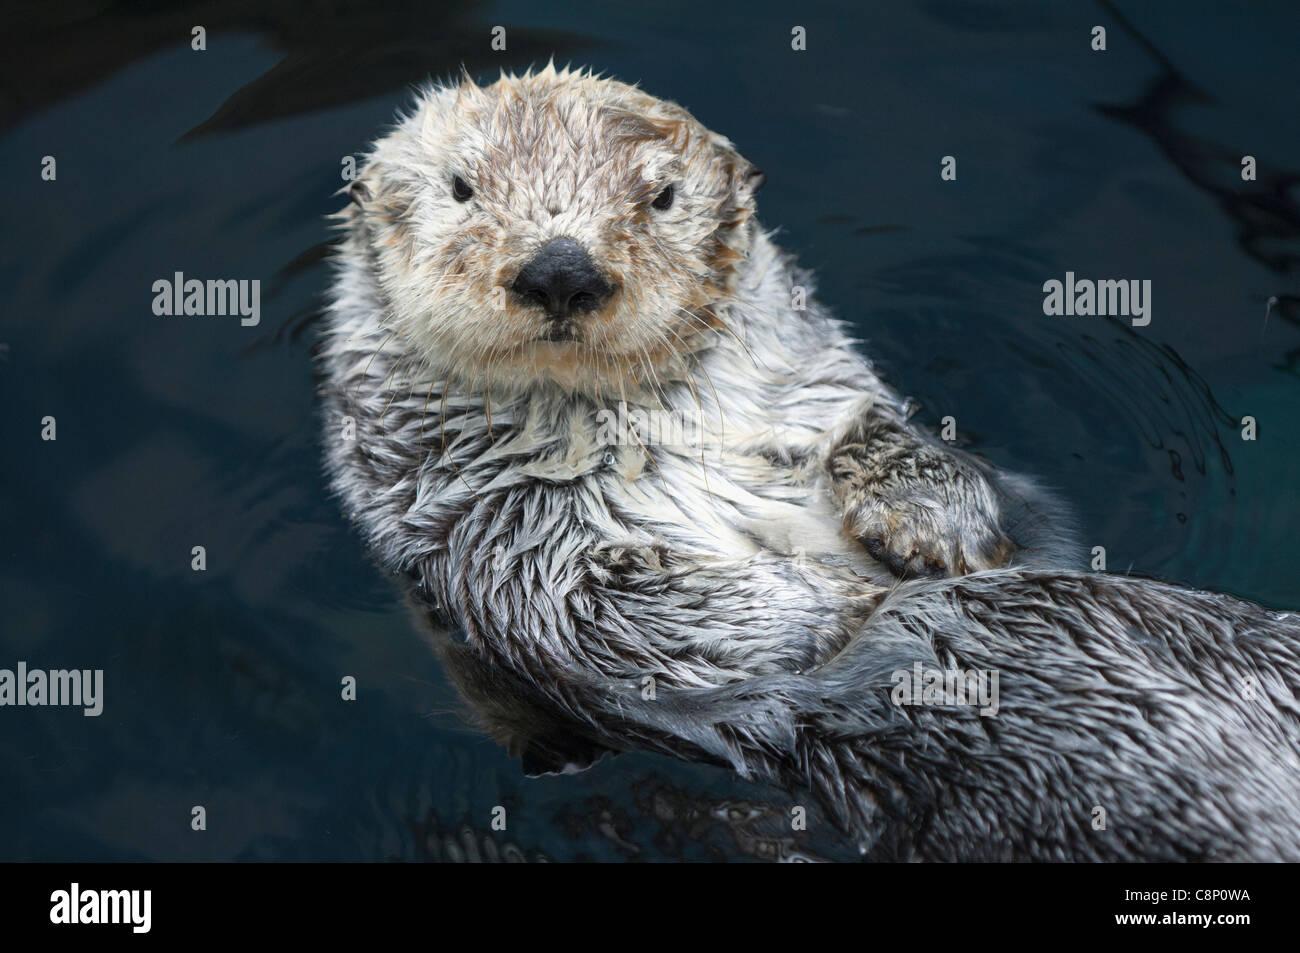 Sea Otter (Enhydra lutris lutris) - Stock Image